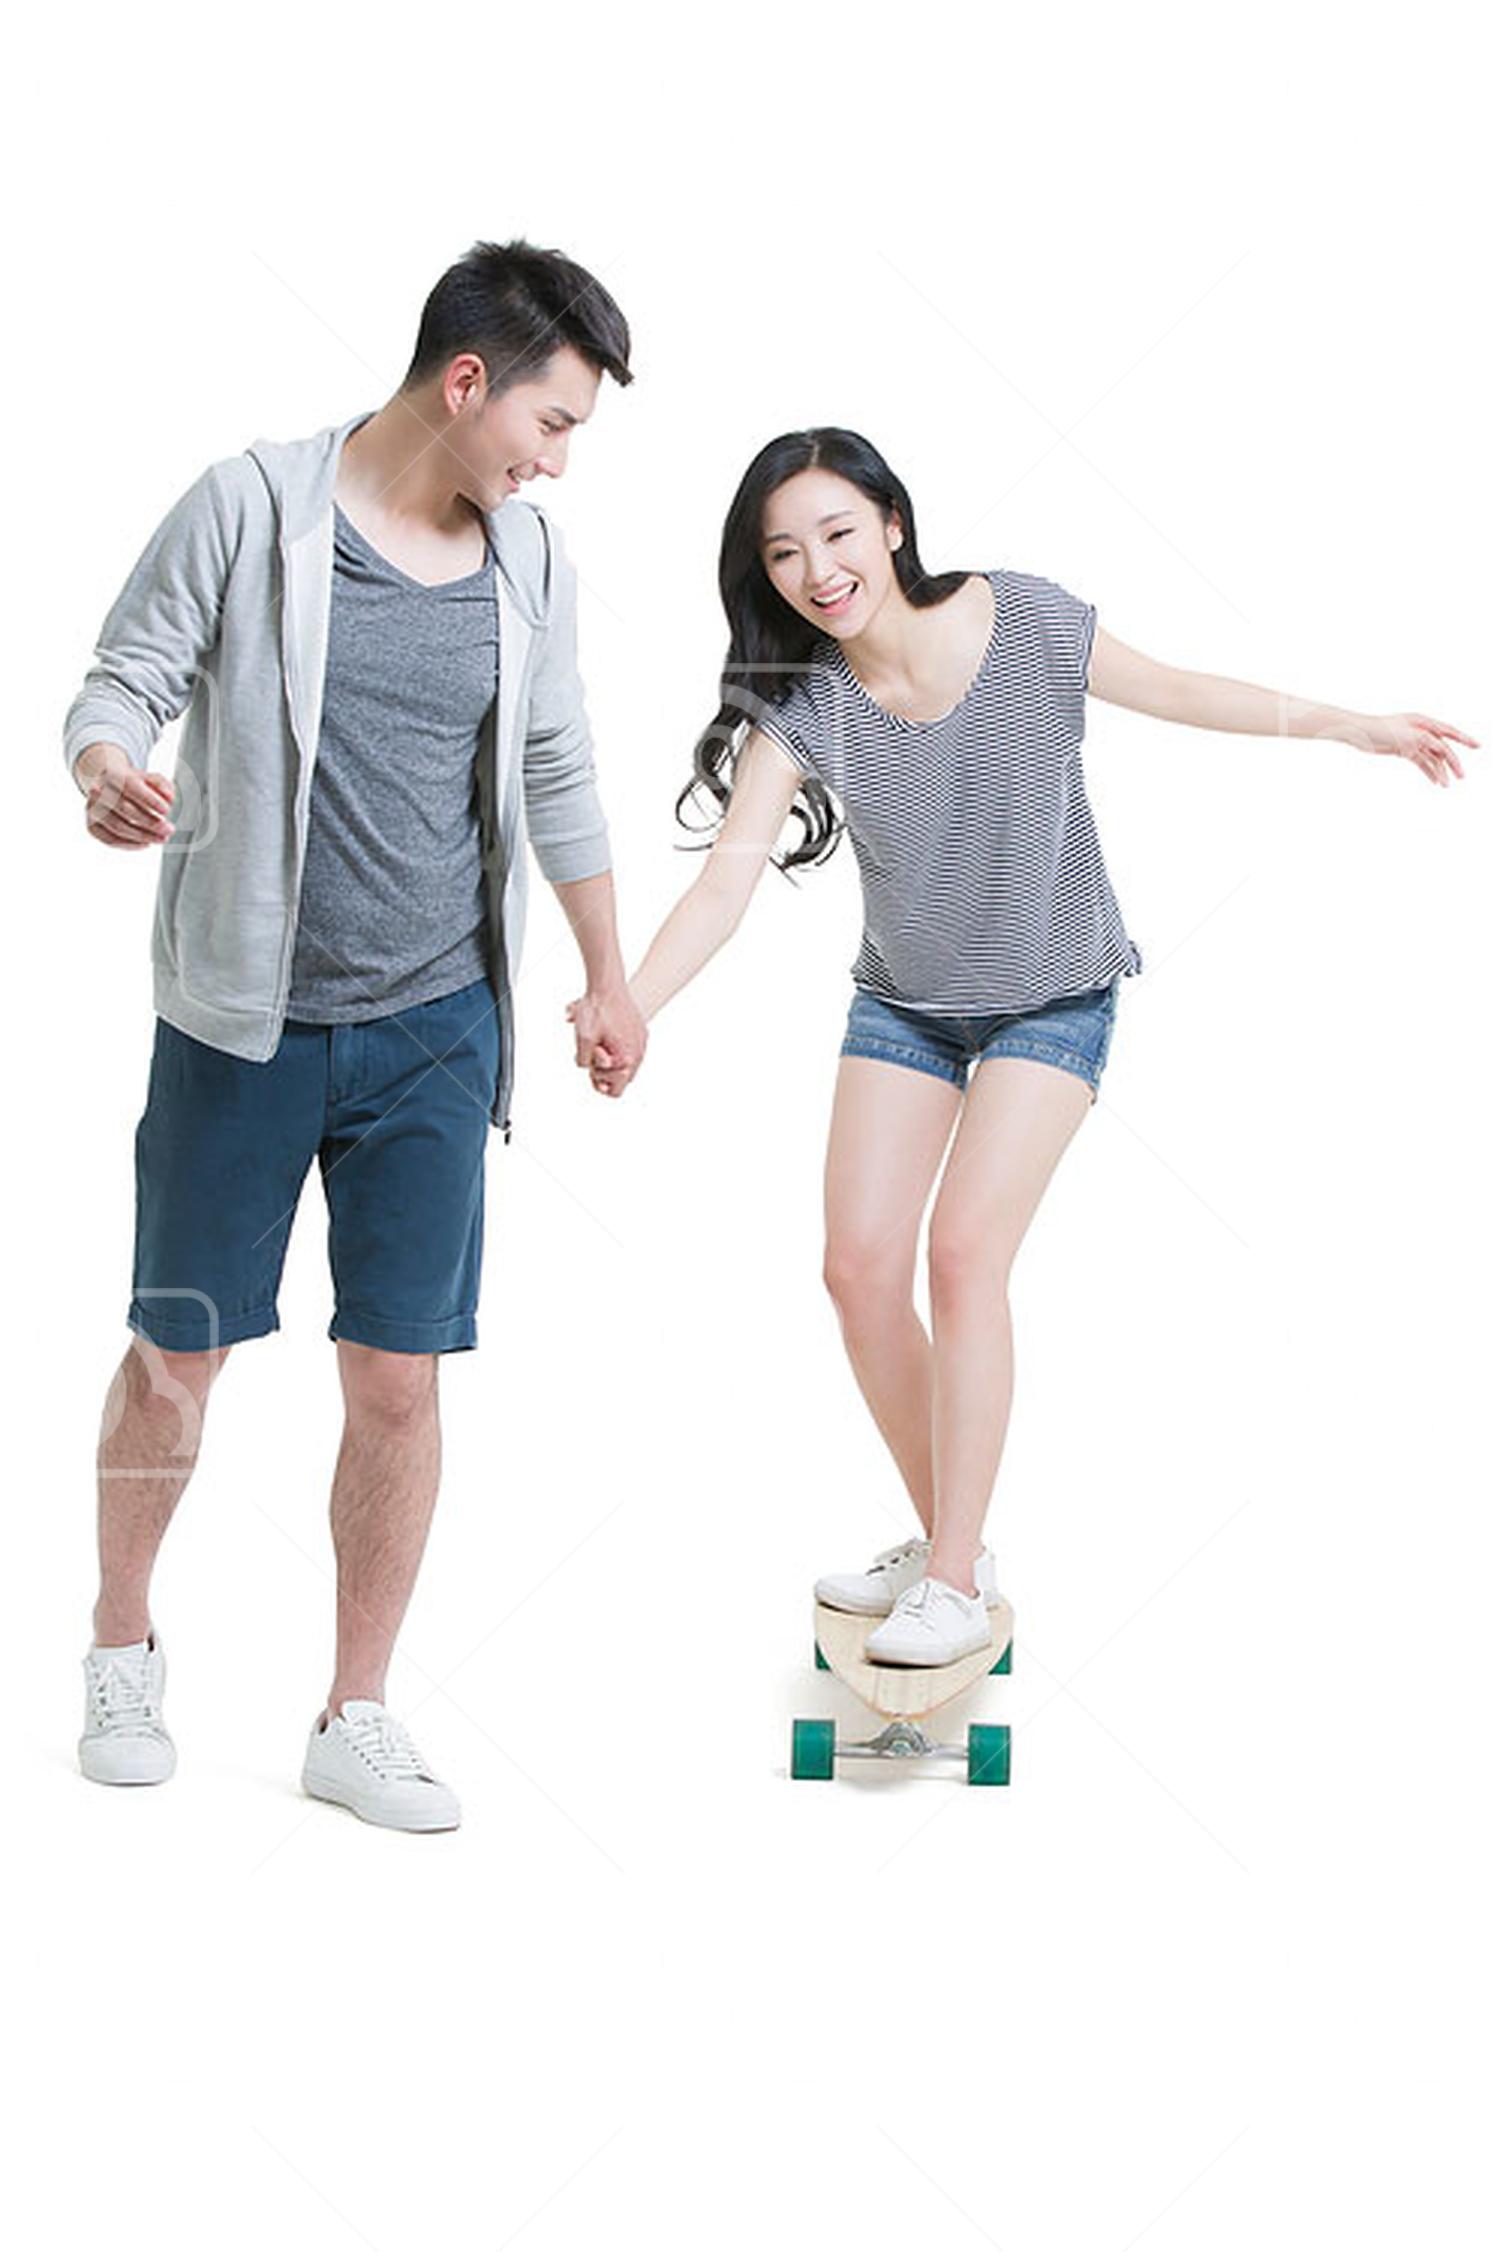 Young Chinese man teaching girlfriend to skateboard